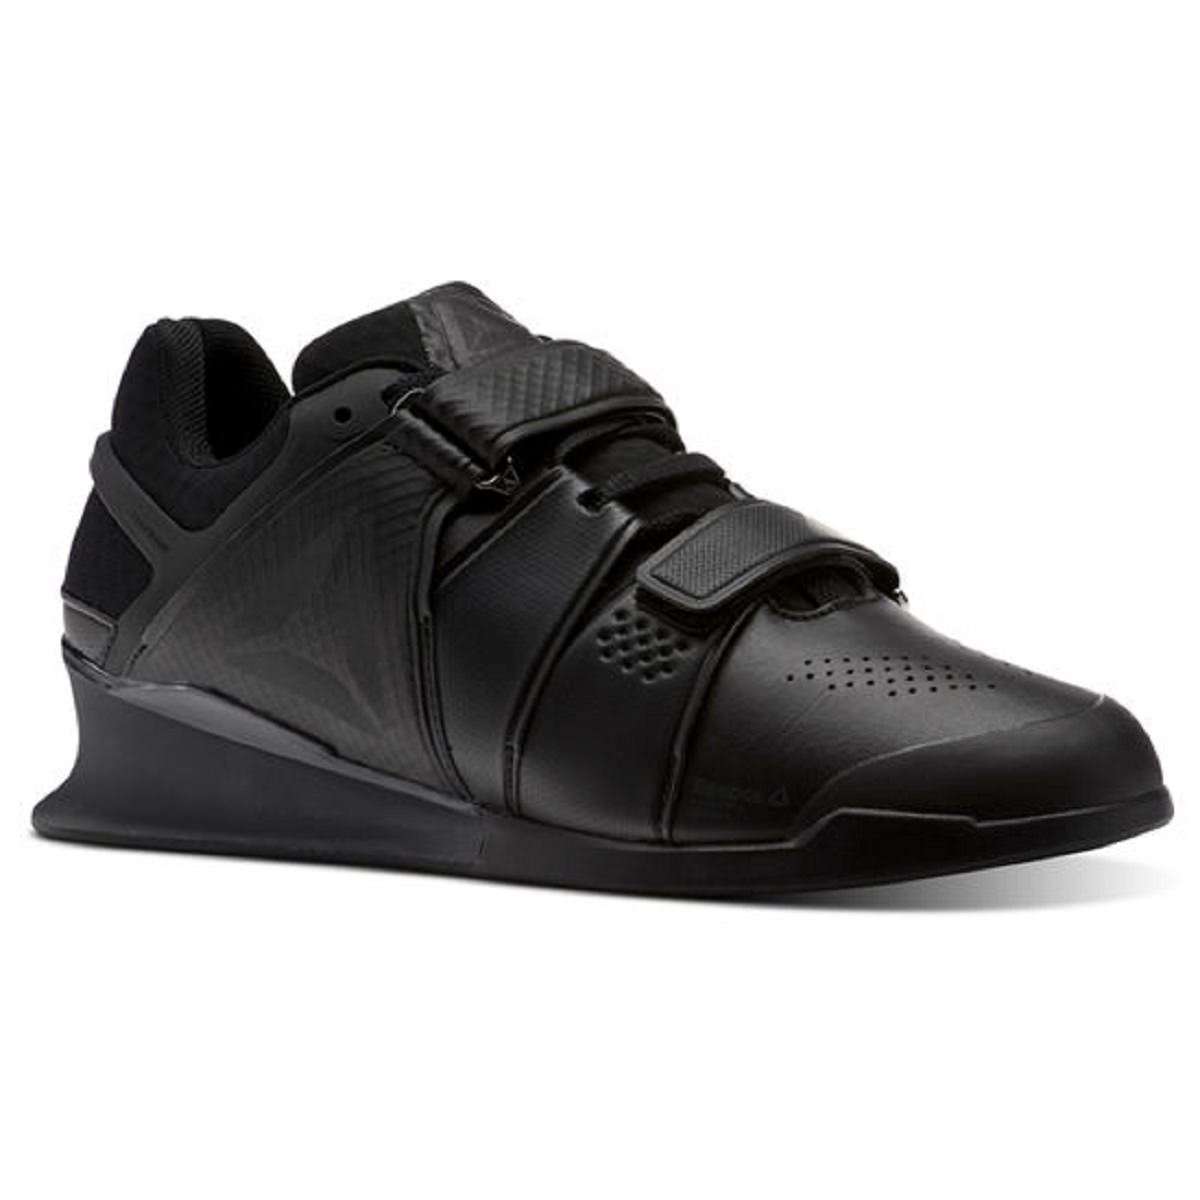 Galleon - Reebok Legacy Lifter Sneaker - Black - Mens - 11 0e947db64